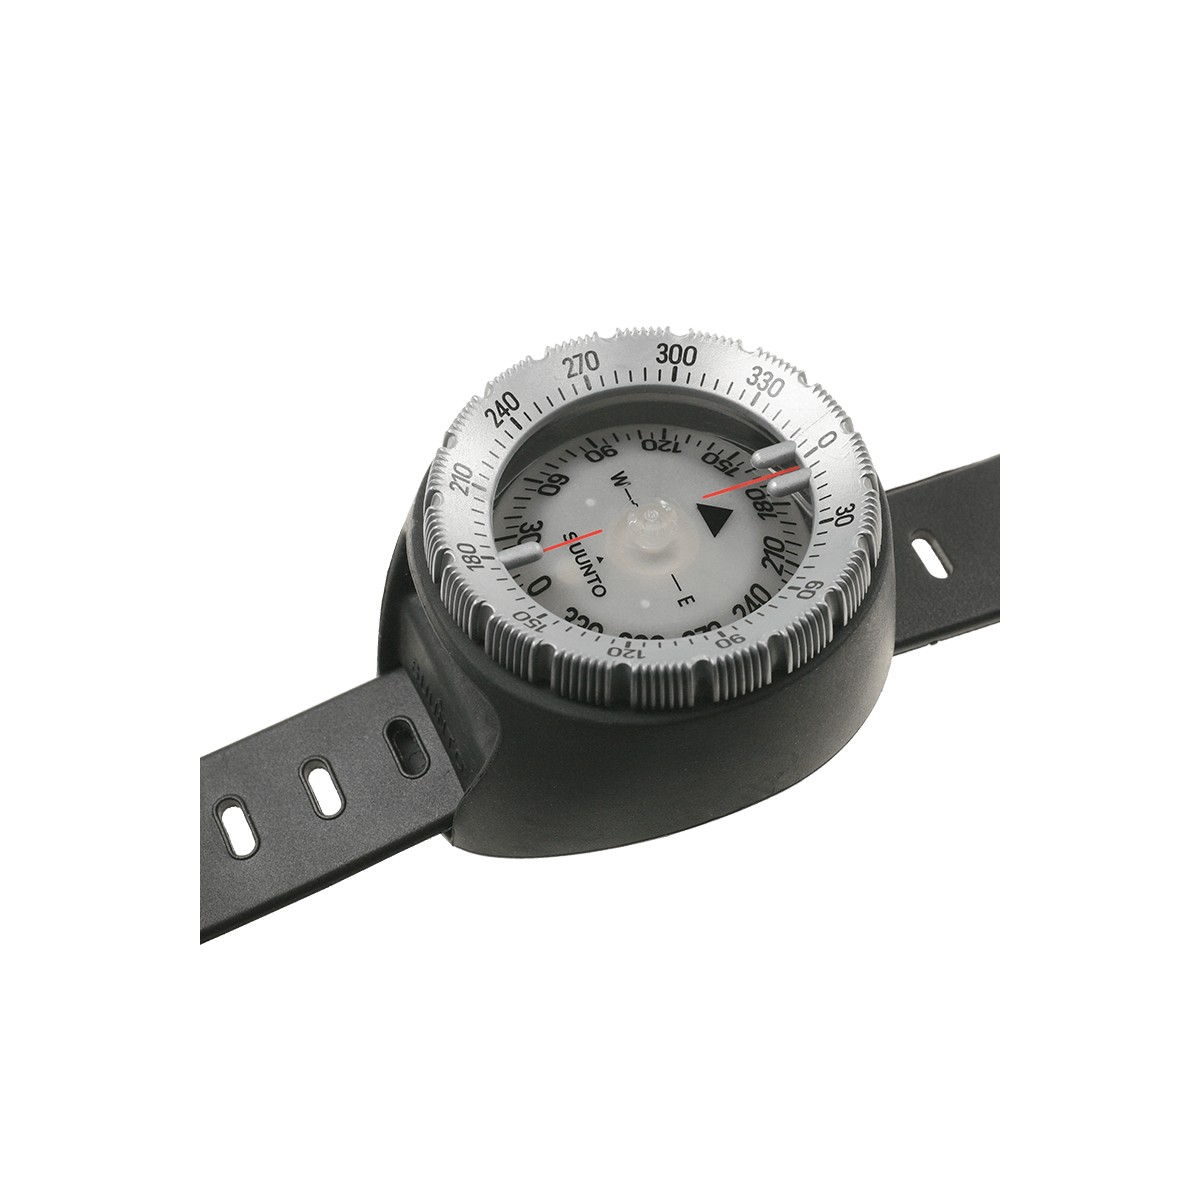 SUUNTO SK-8 STRAP MOUNT NH Compass